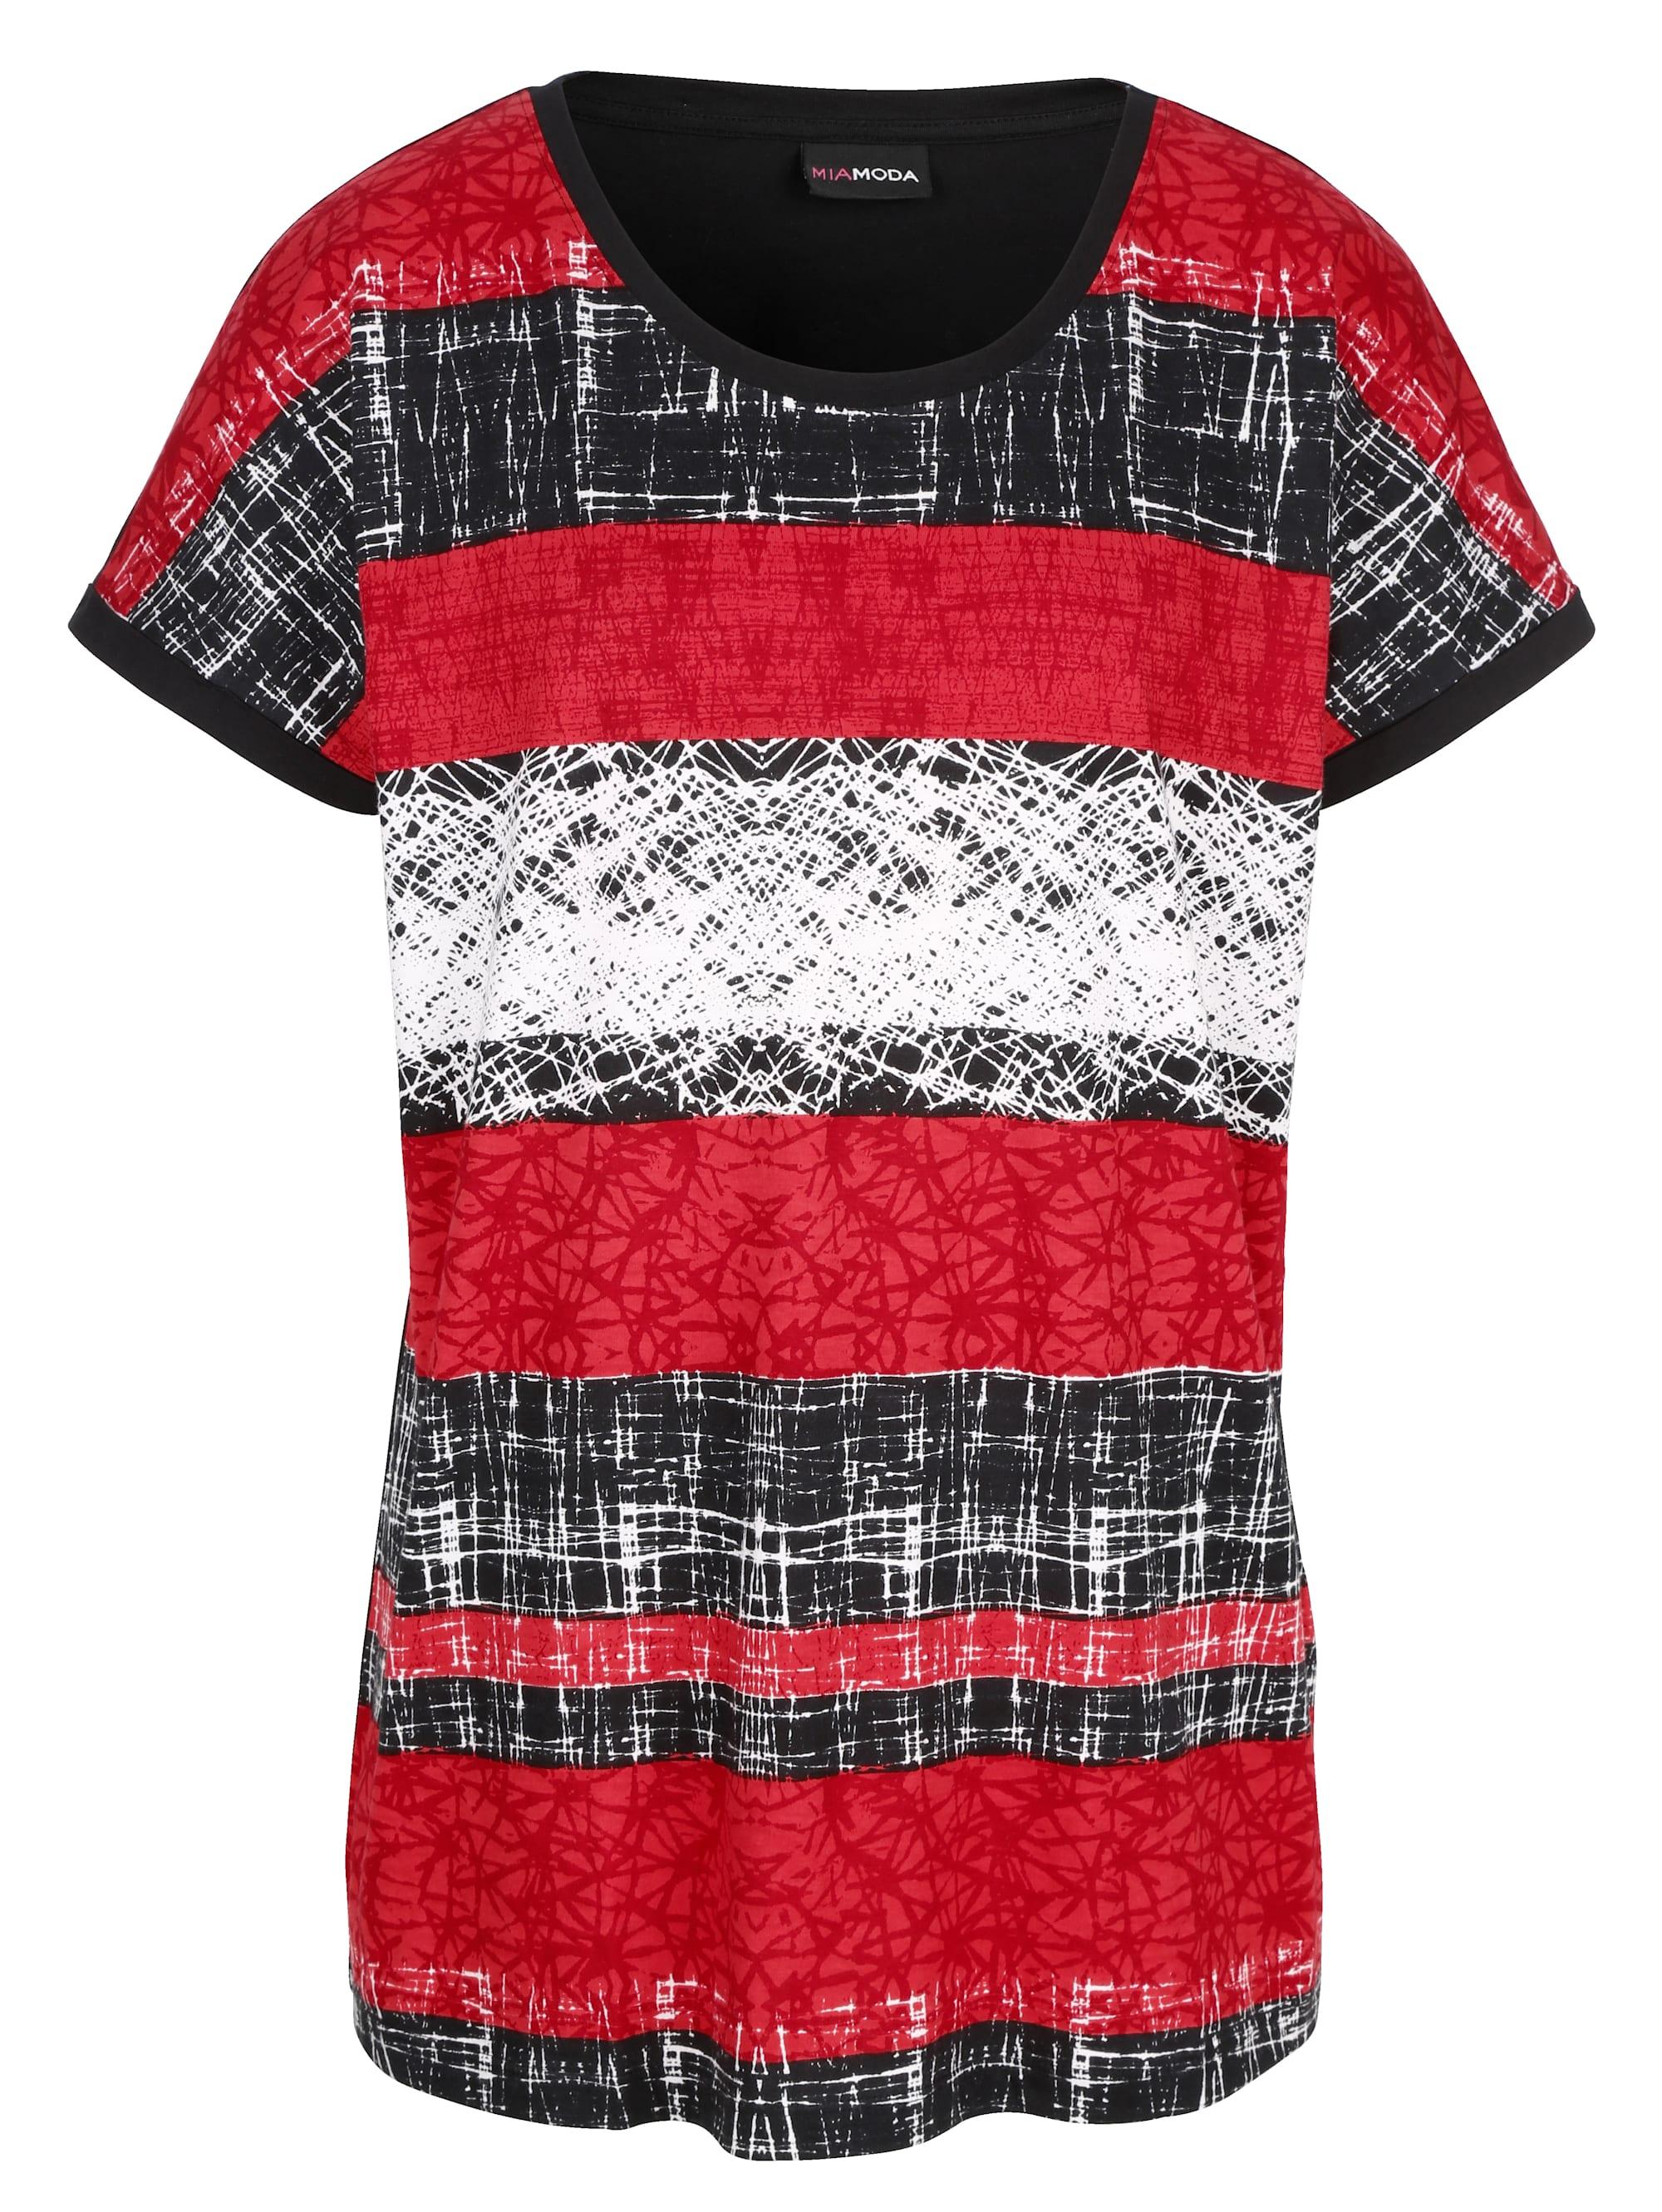 miamoda -  Print-Shirt, mit platziertem Druck